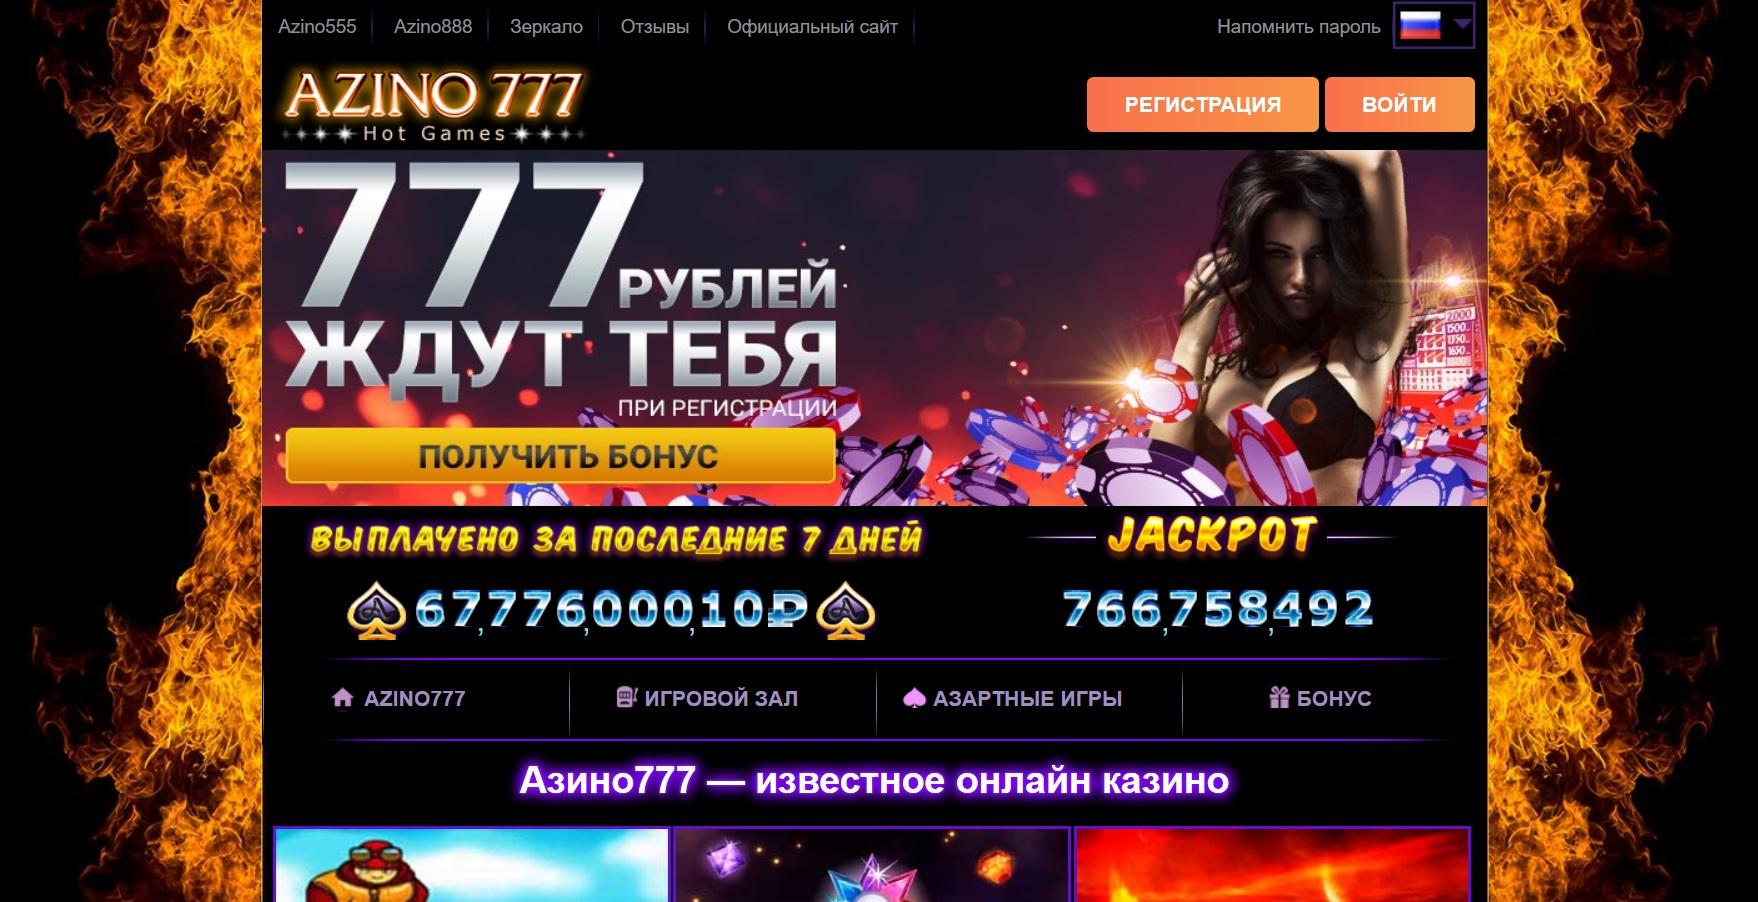 28122019 azino777